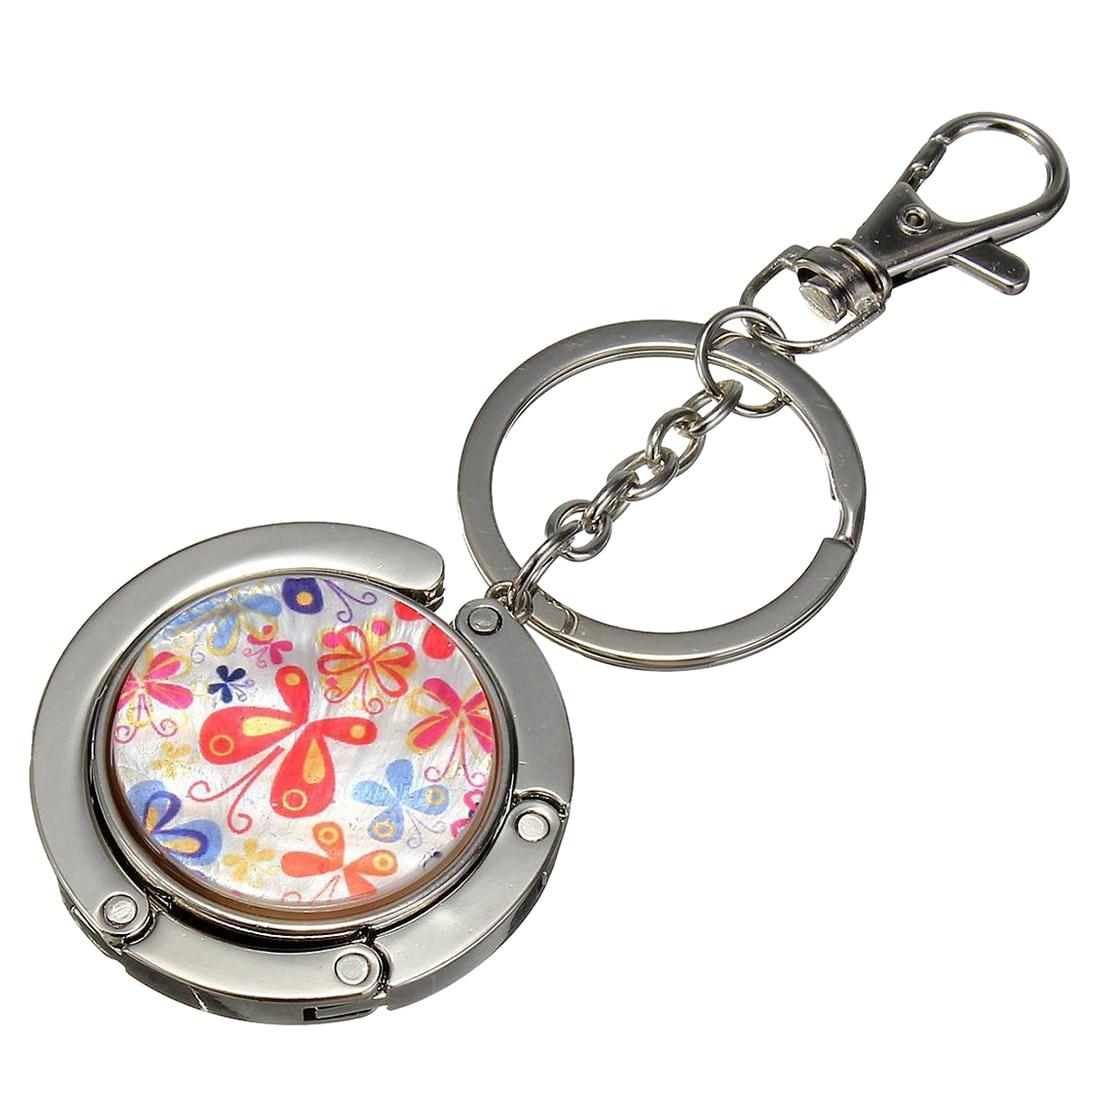 Keychain / Folding Handbag Hook Bag Hook Metal Door Table Butterfly Light Red